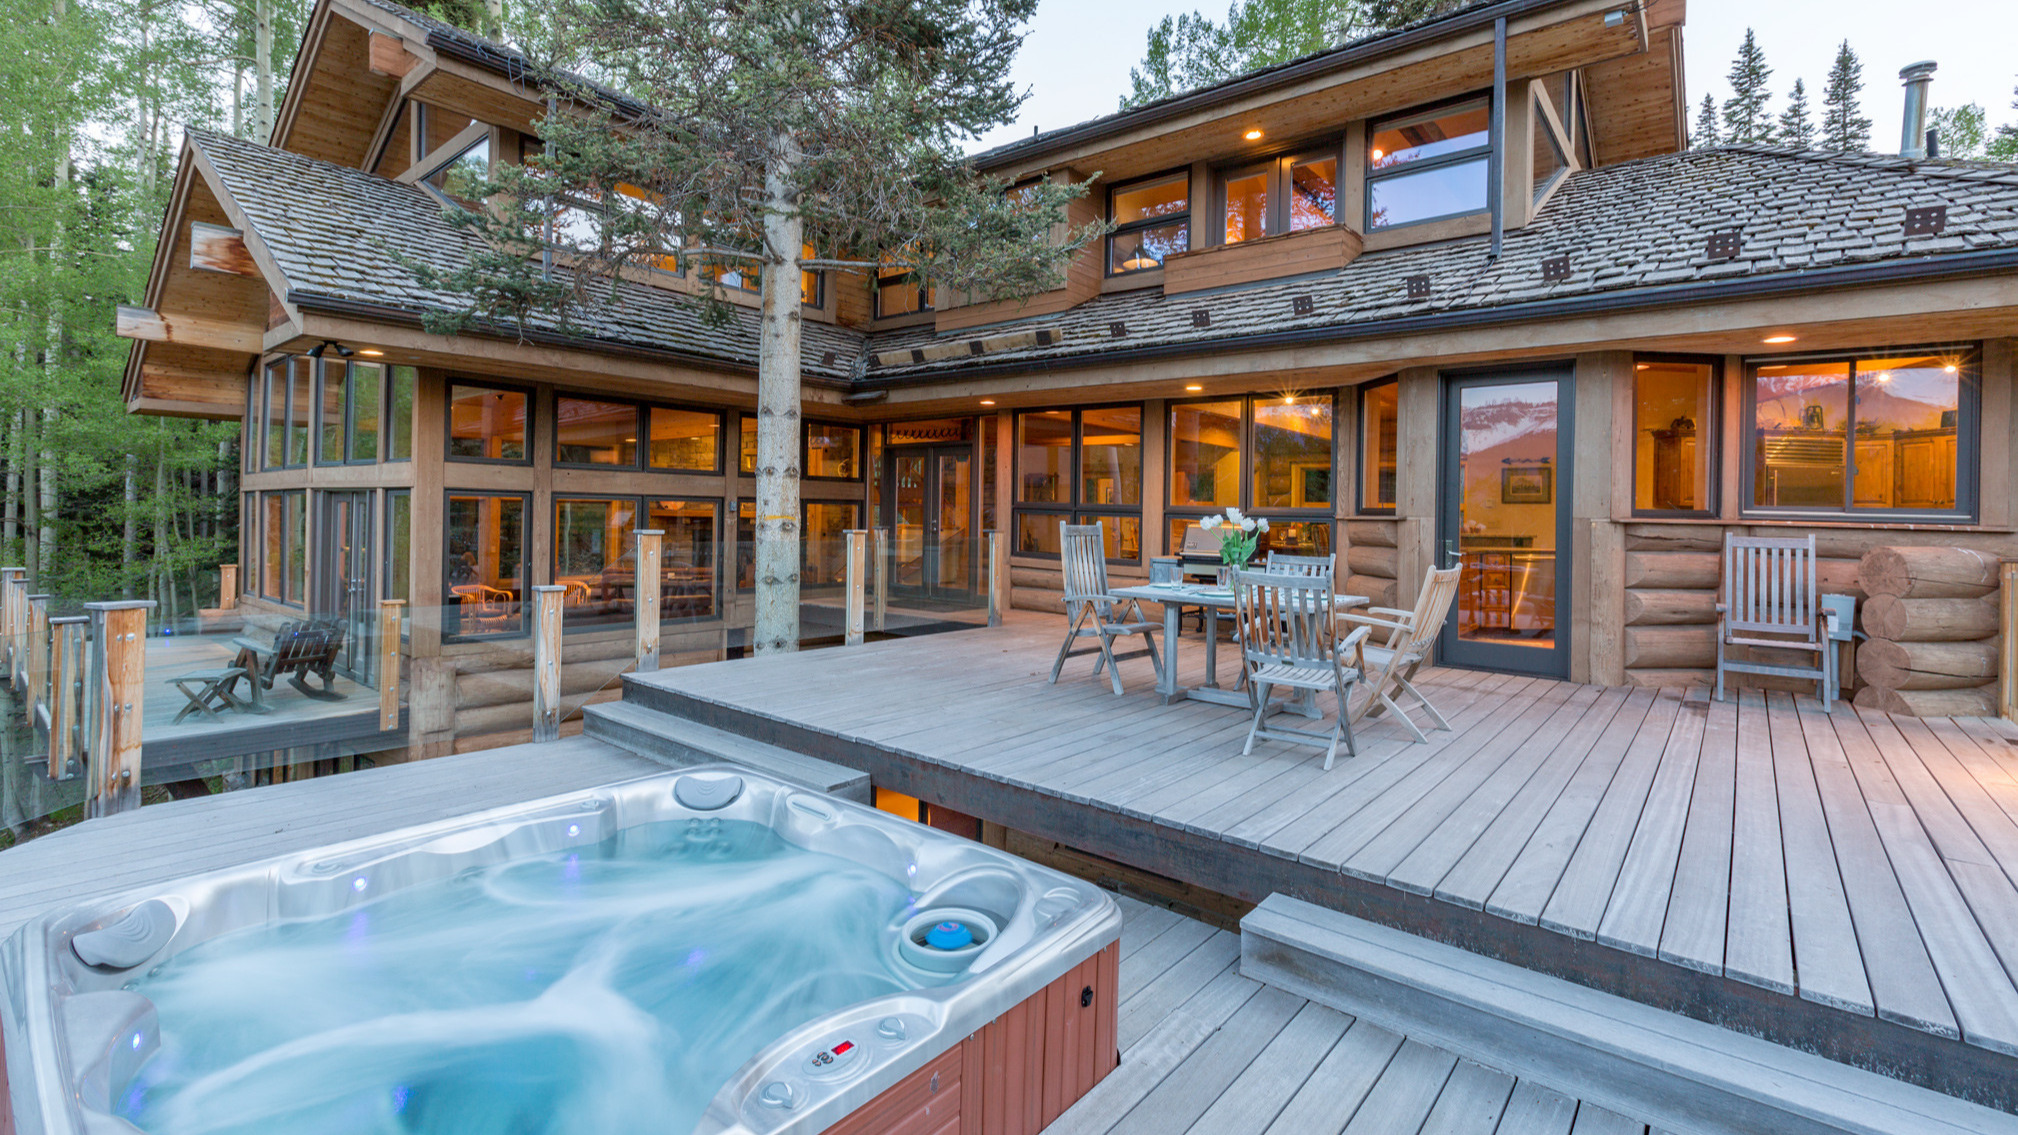 denver co vacation rentals house